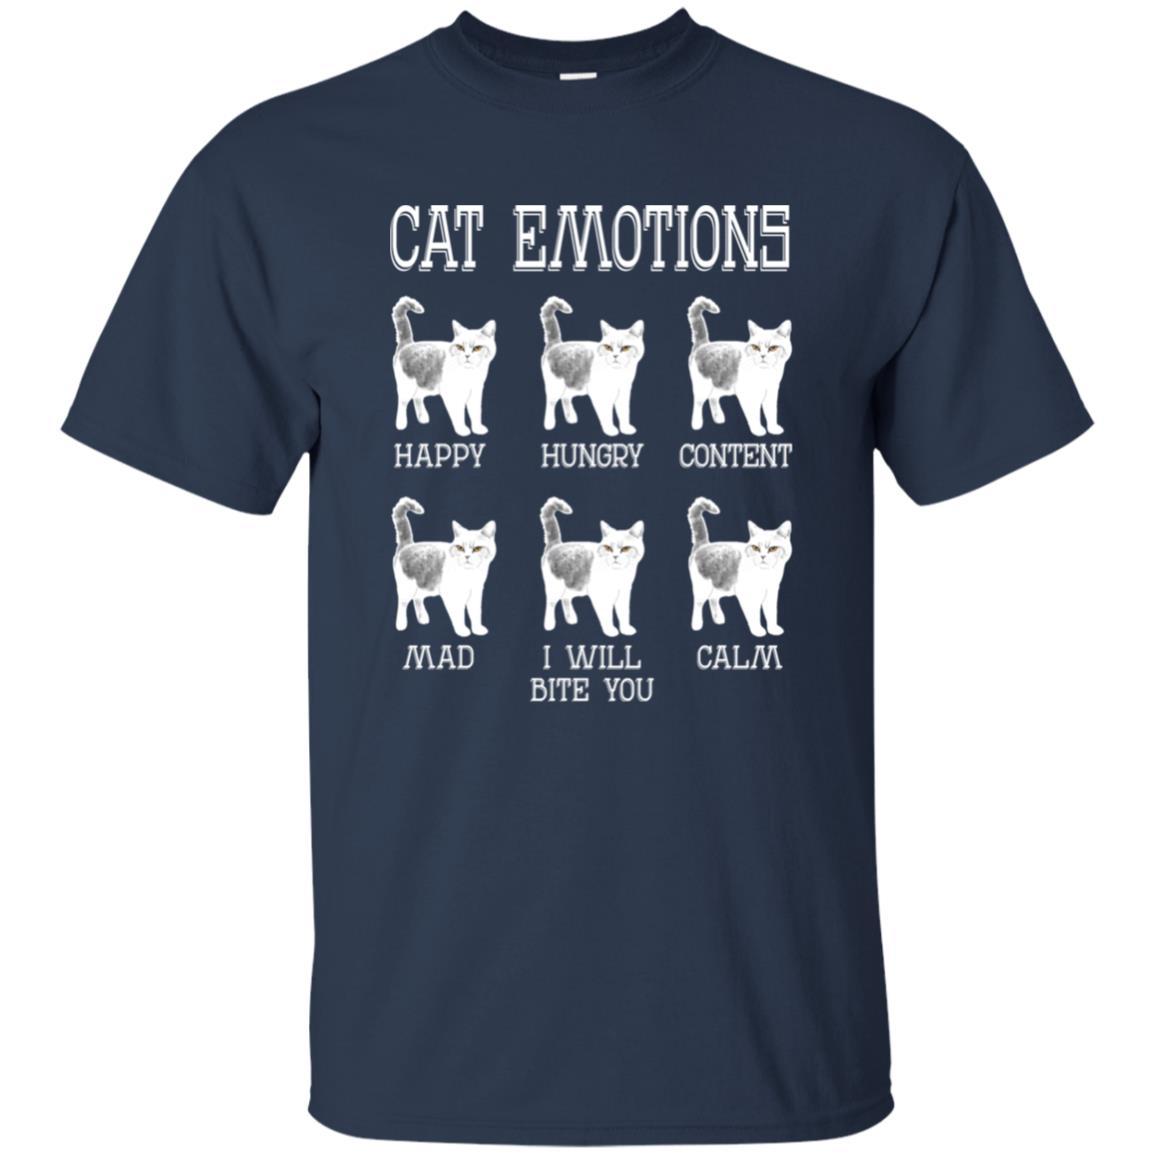 Funny Cat s Cat Emotions for Cat Fans Unisex Short Sleeve